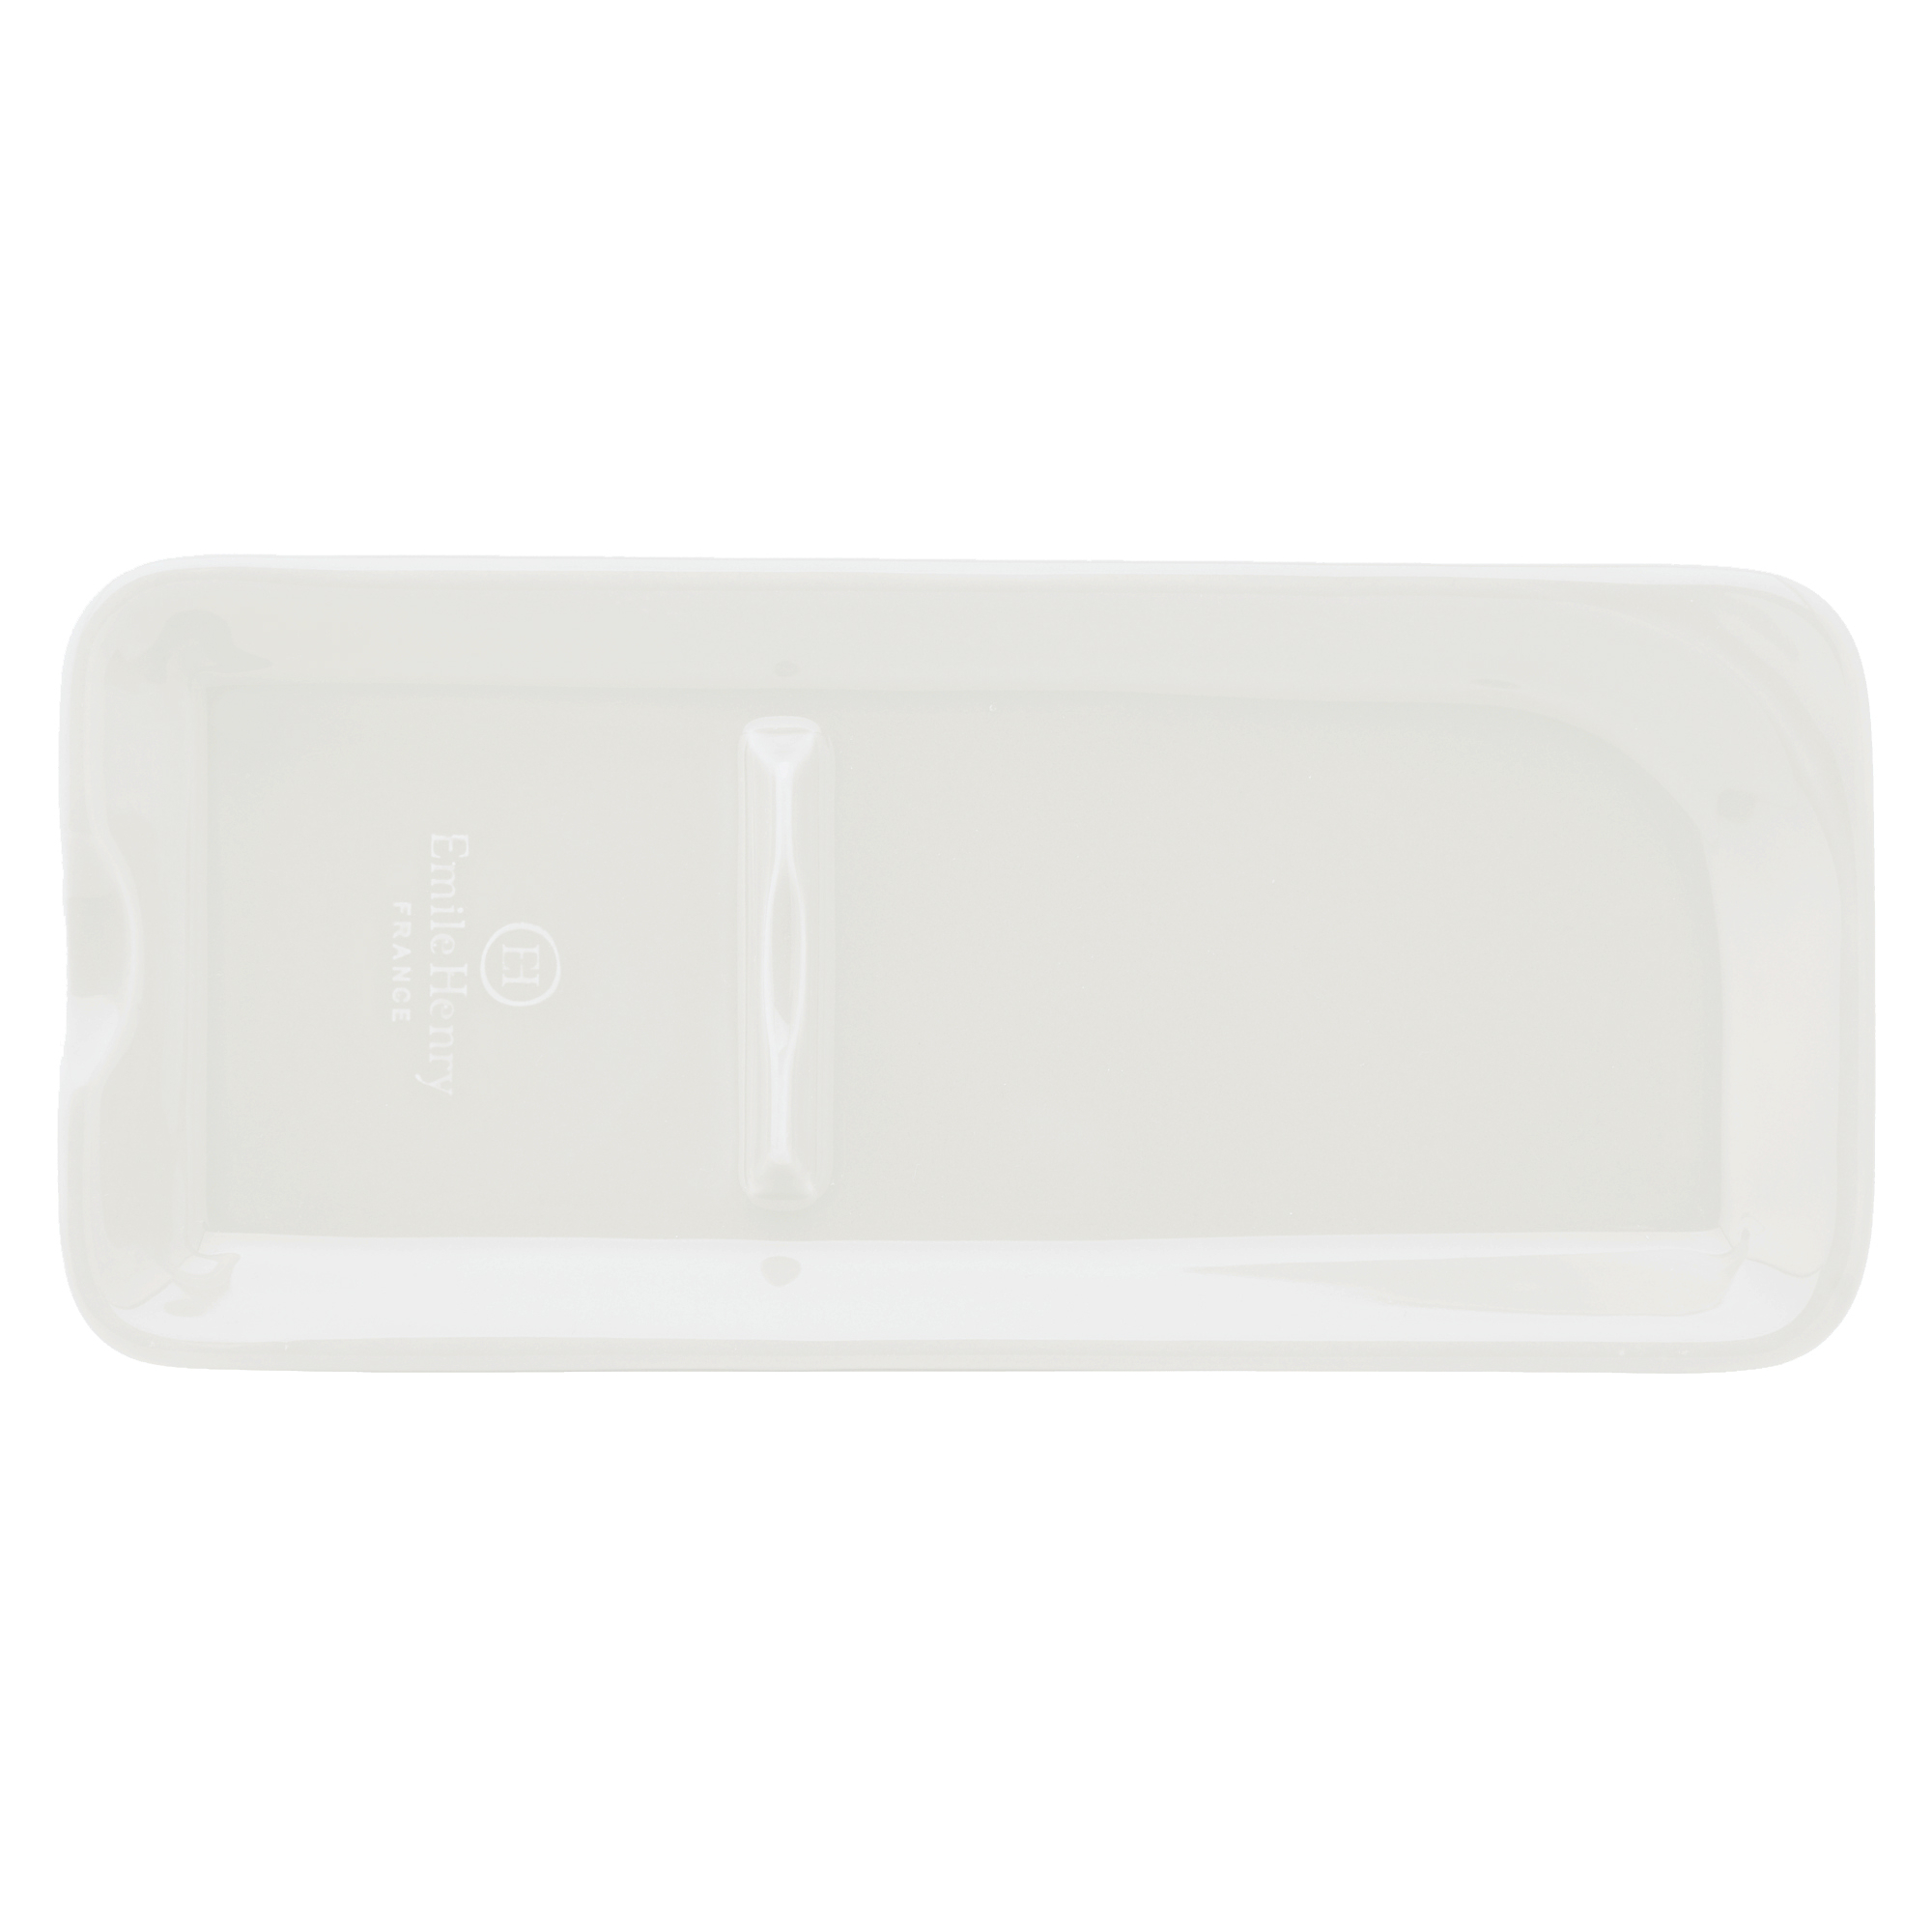 Emile Henry Nougat Ceramic 9 x 4 Inch Spoon Rest